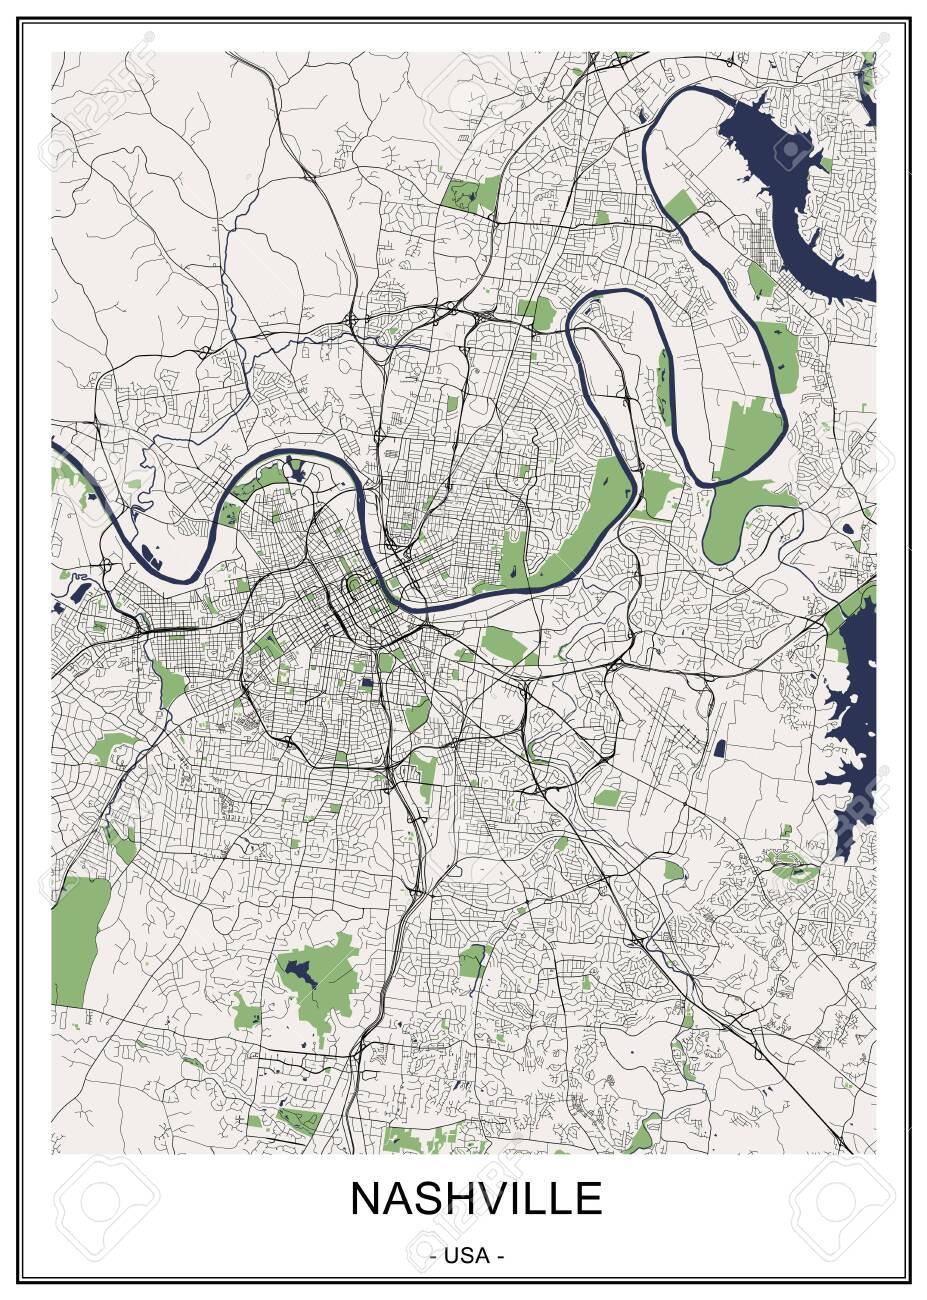 map of the city of Nashville, Tennessee, USA Tennessee In Usa Map on usa map chattanooga, usa map south carolina, usa map wisconsin, usa map memphis, usa map california, usa map cleveland, usa map new mexico, usa map nashville, usa map white, usa map florida, usa map michigan, usa map delaware, usa map oklahoma, usa map iowa, usa map alabama, usa map north carolina, usa map pennsylvania, usa map new york city, usa map knoxville, usa map arizona,